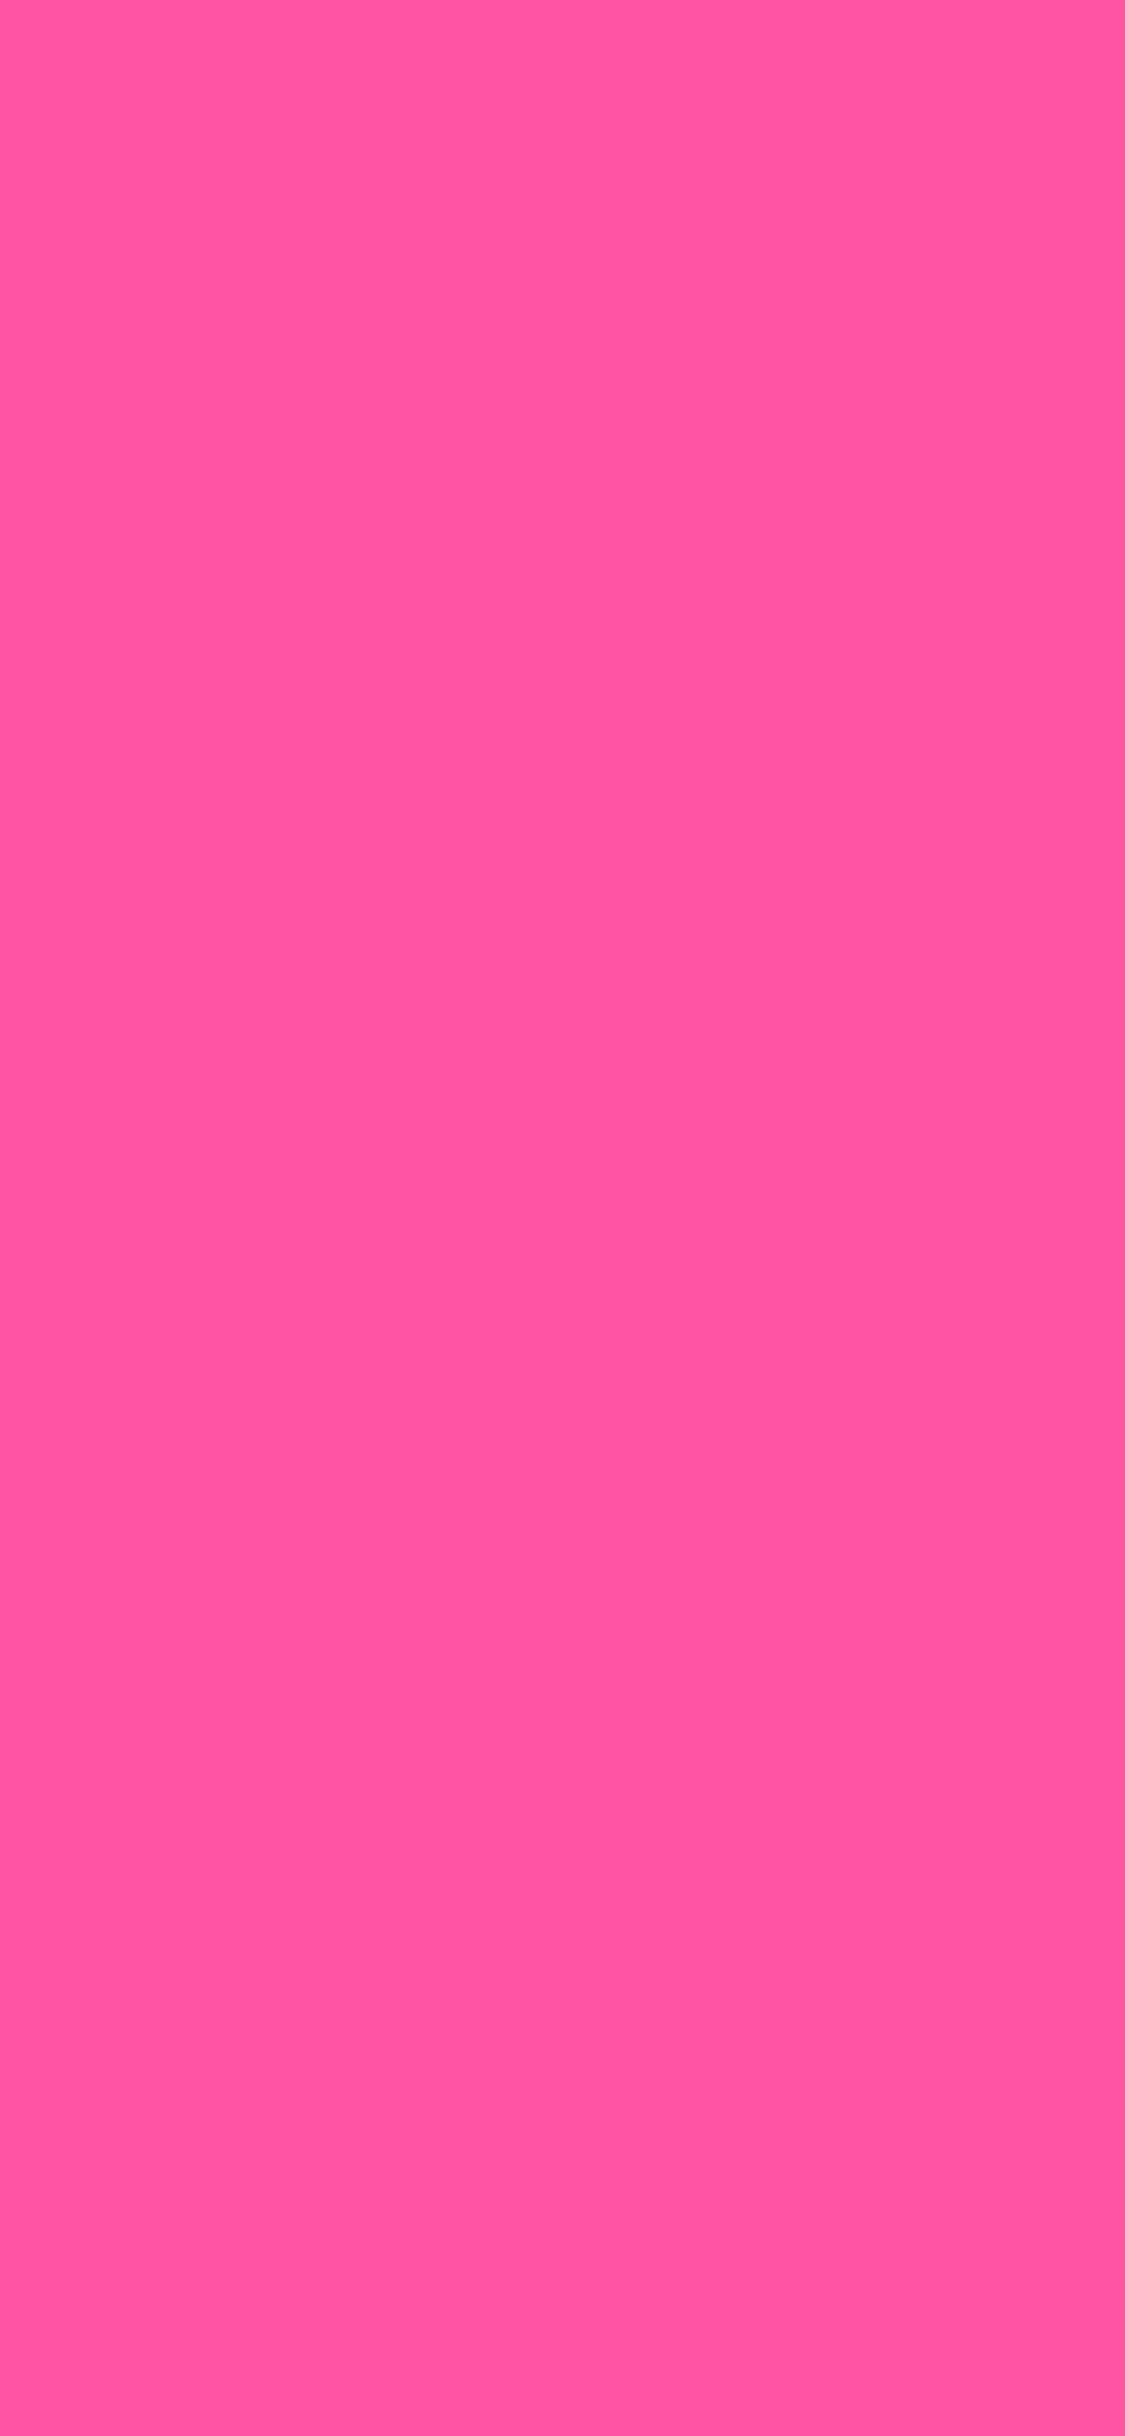 1125x2436 Brilliant Rose Solid Color Background